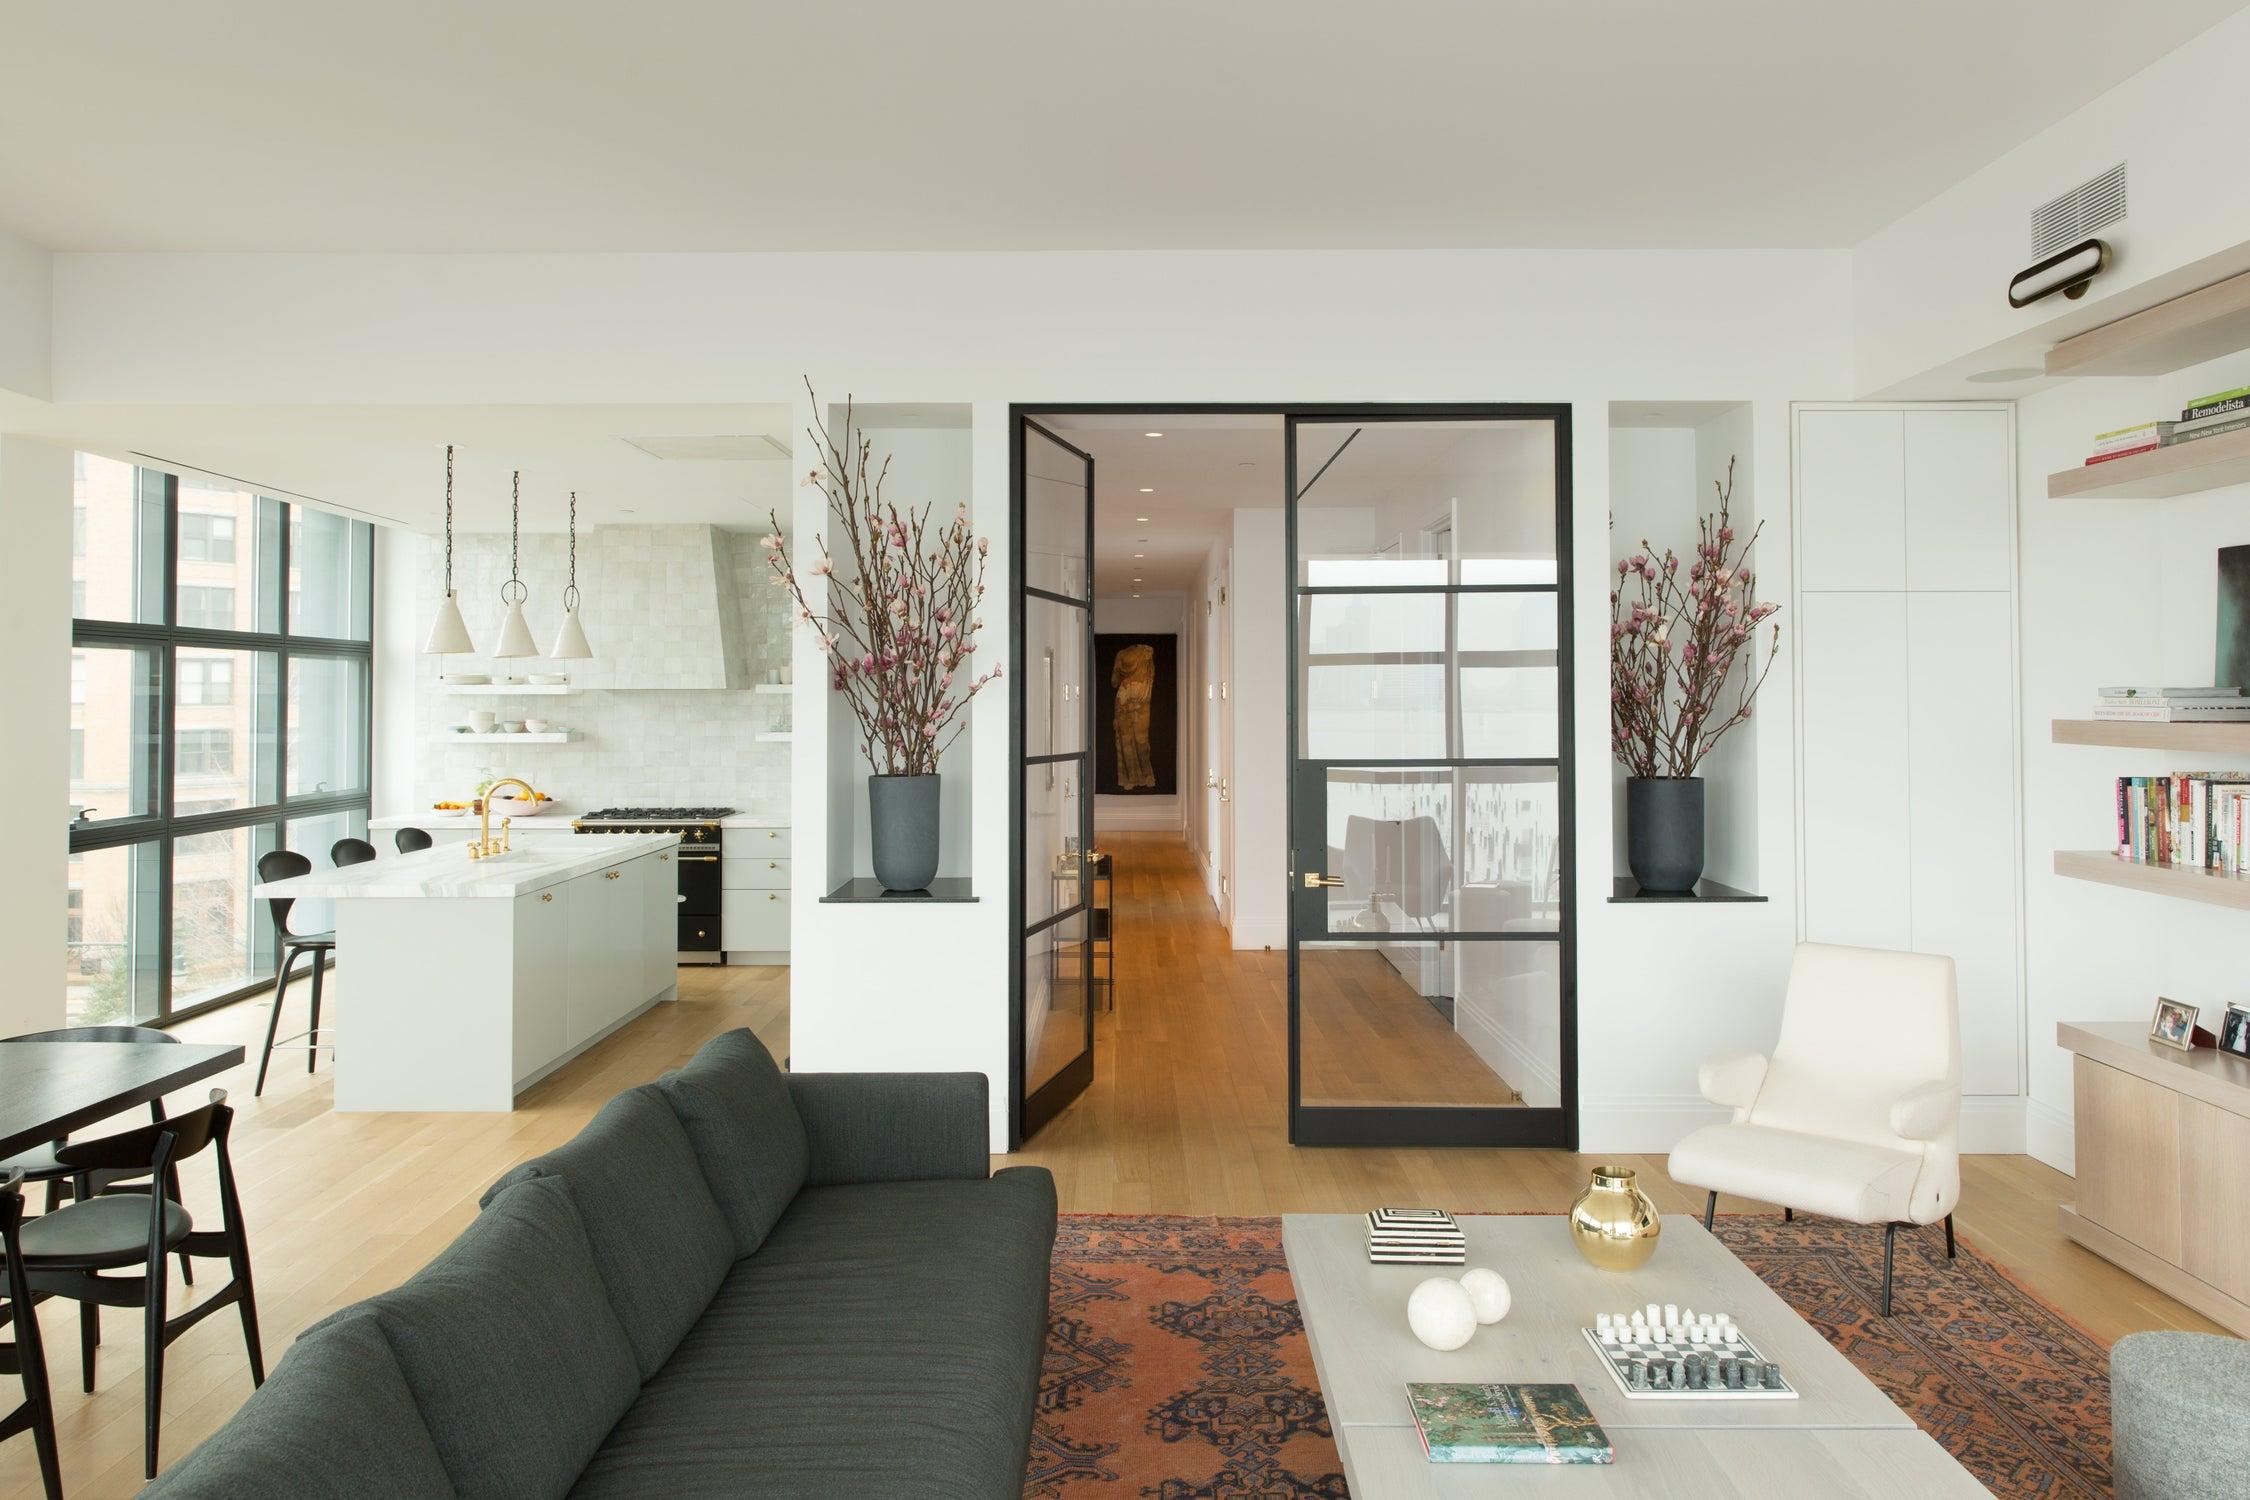 Living Room by Ashe + Leandro on 1stdibs